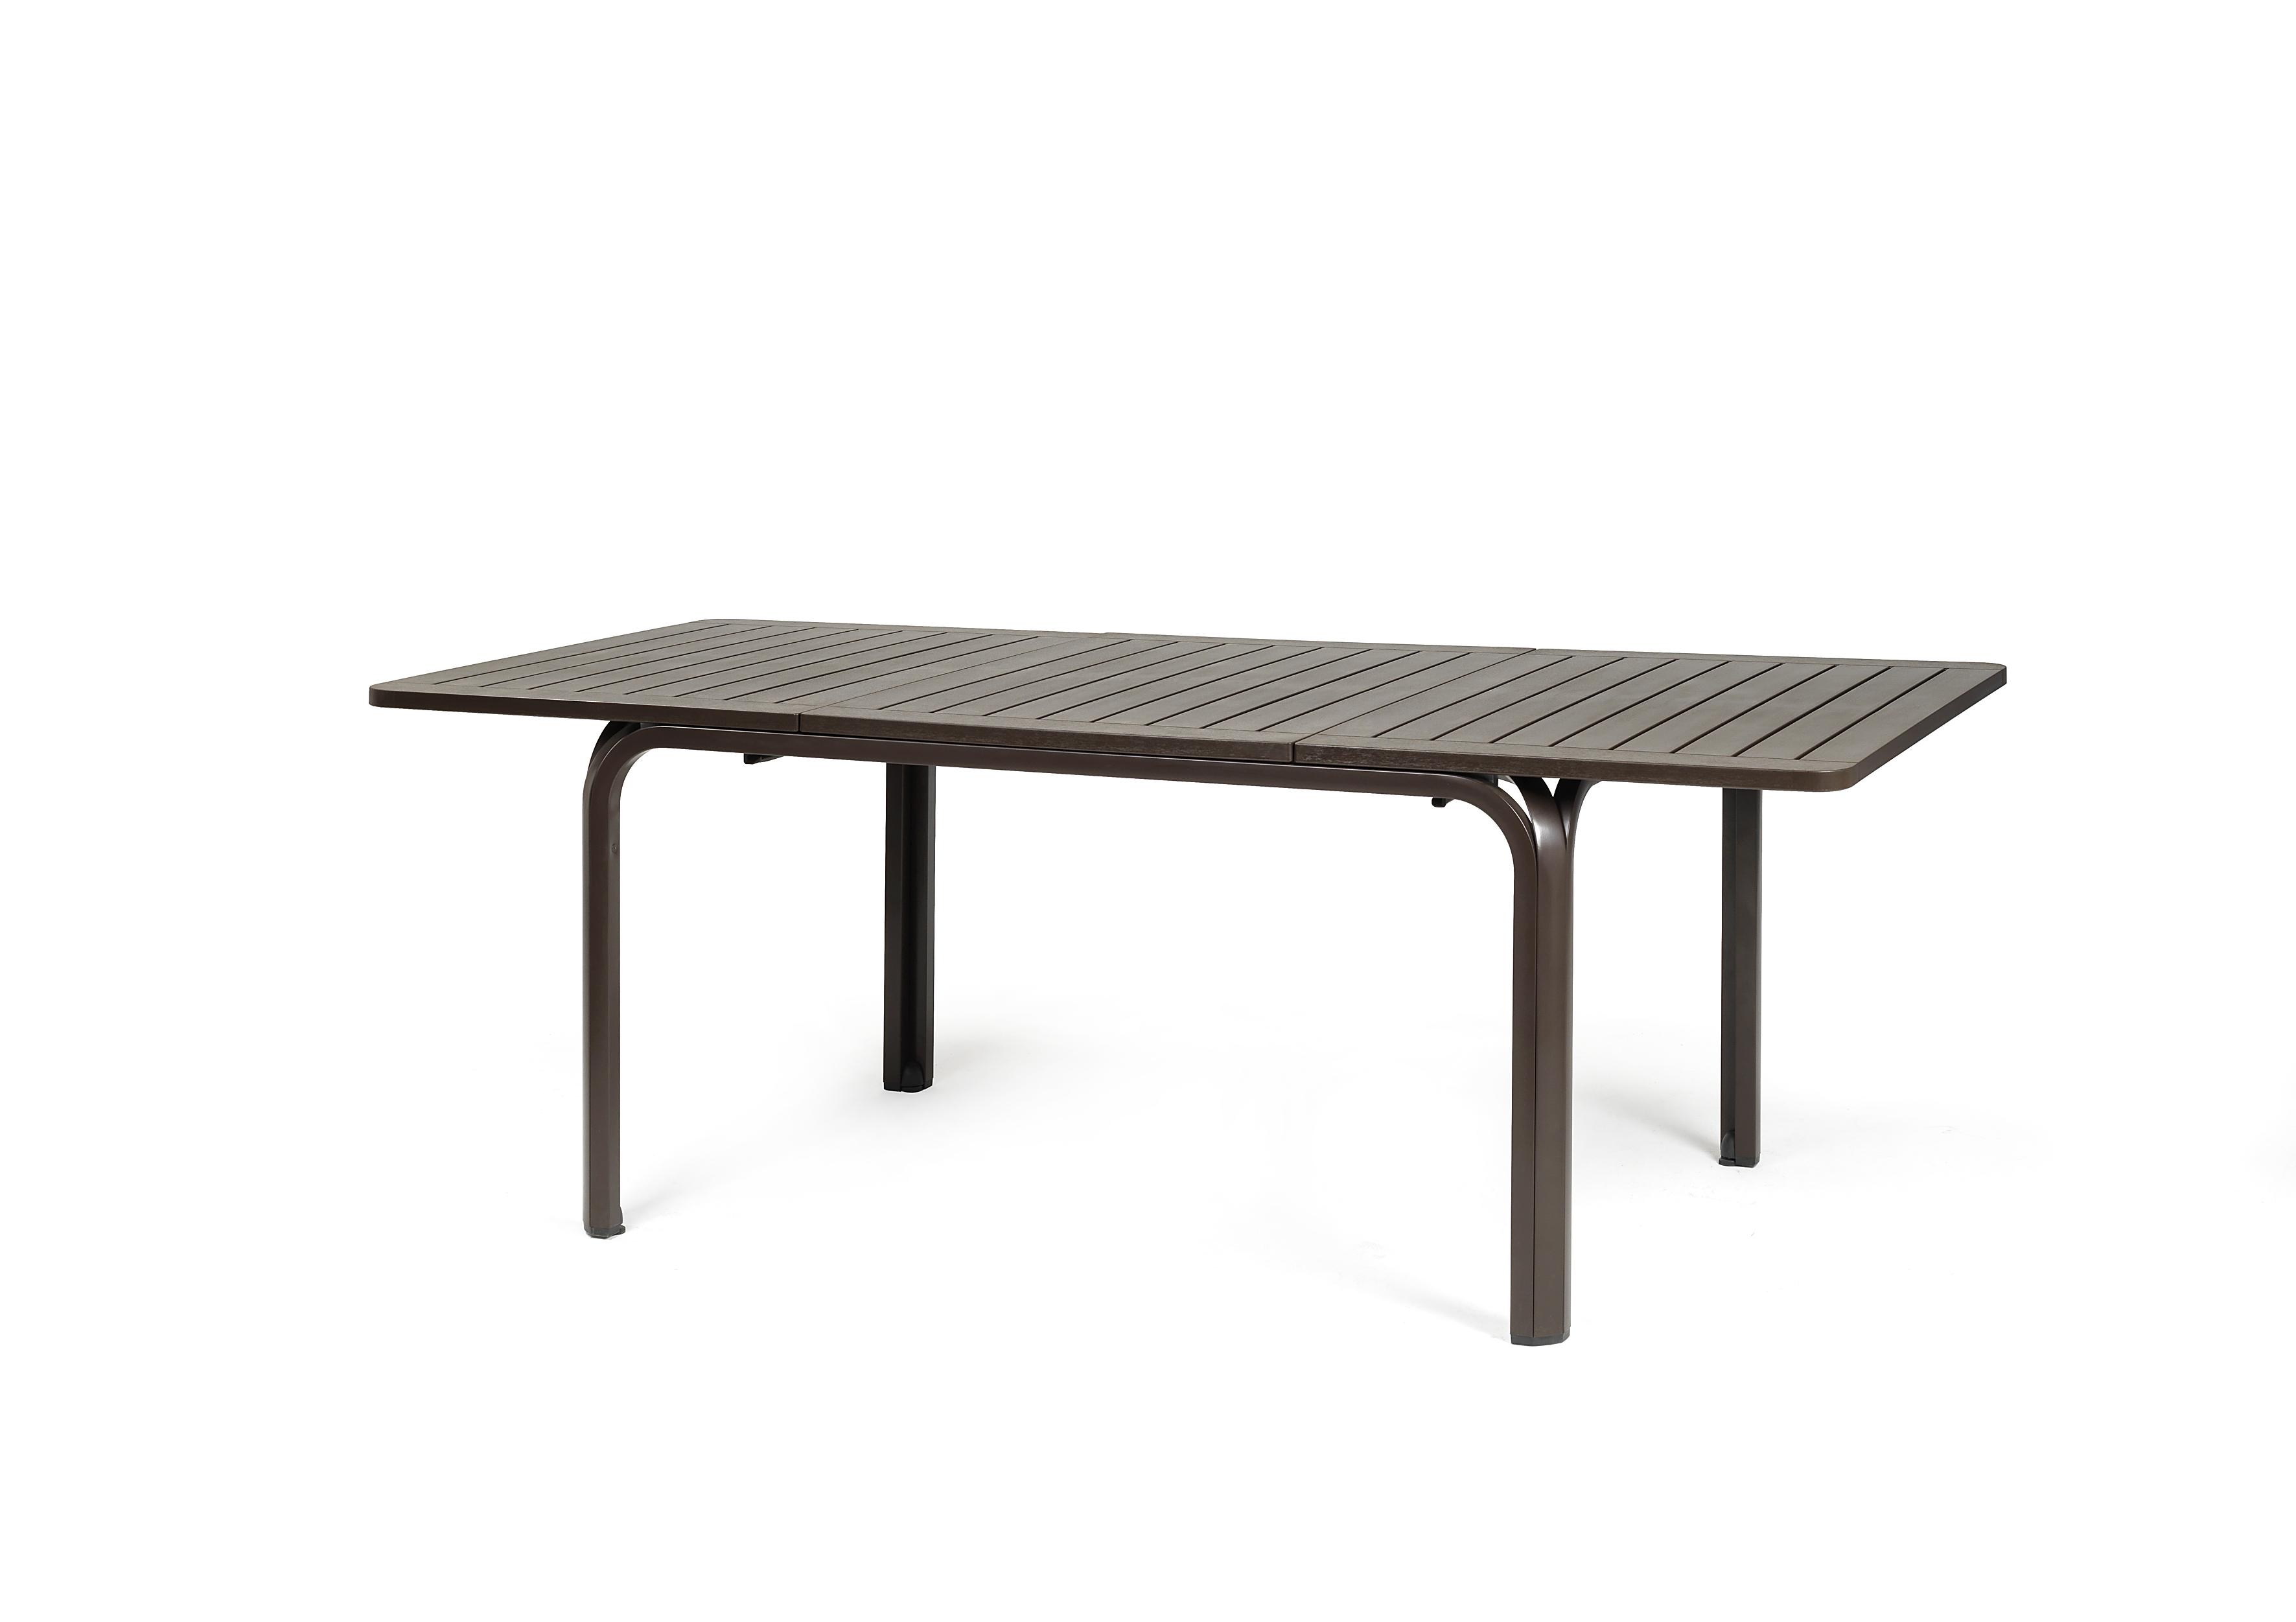 stół do ogrodu alloro 140 nardi